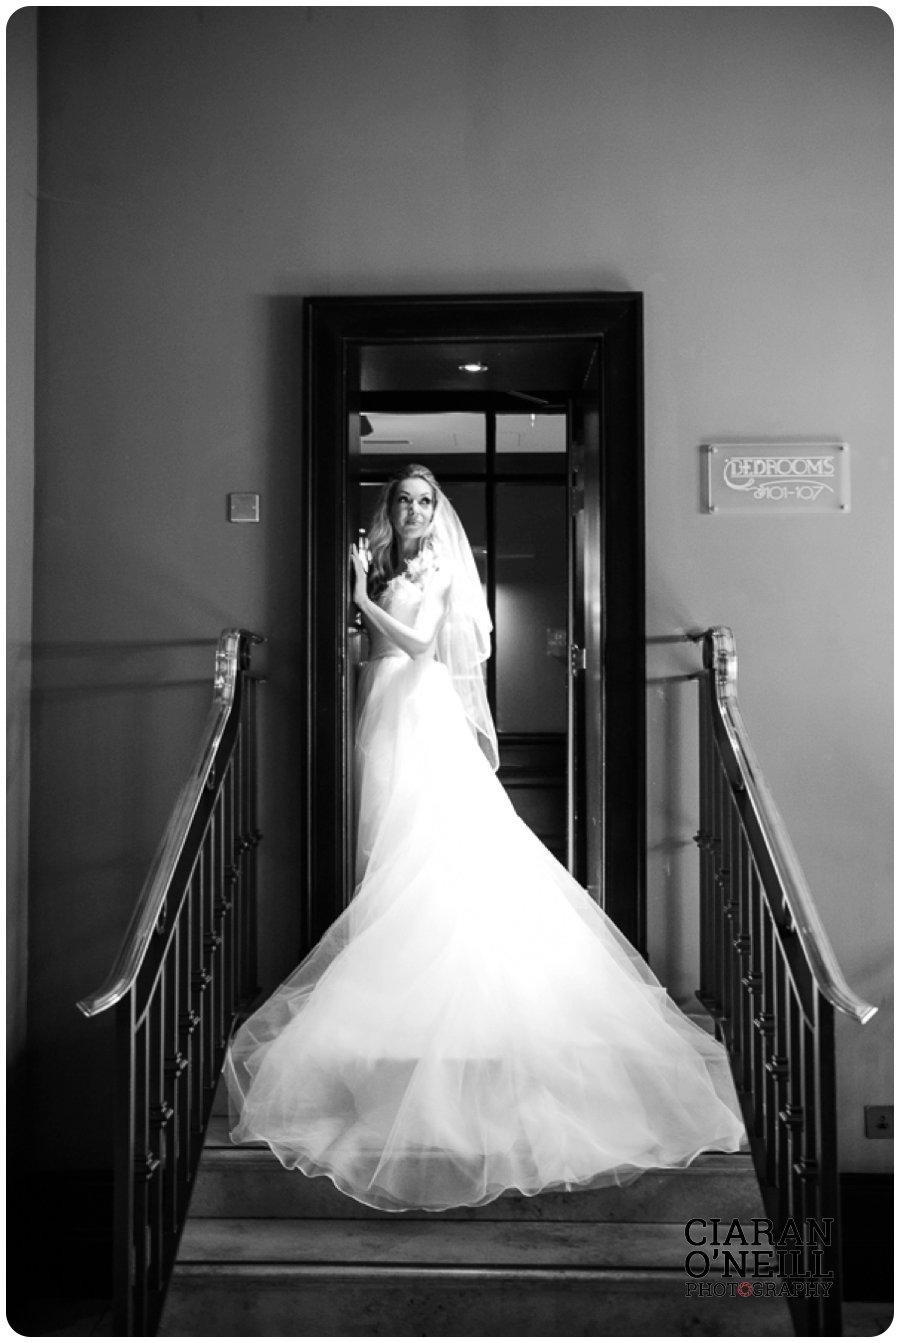 Linda & Jae's wedding at the Merchant Hotel by Ciaran O'Neill Photography 21